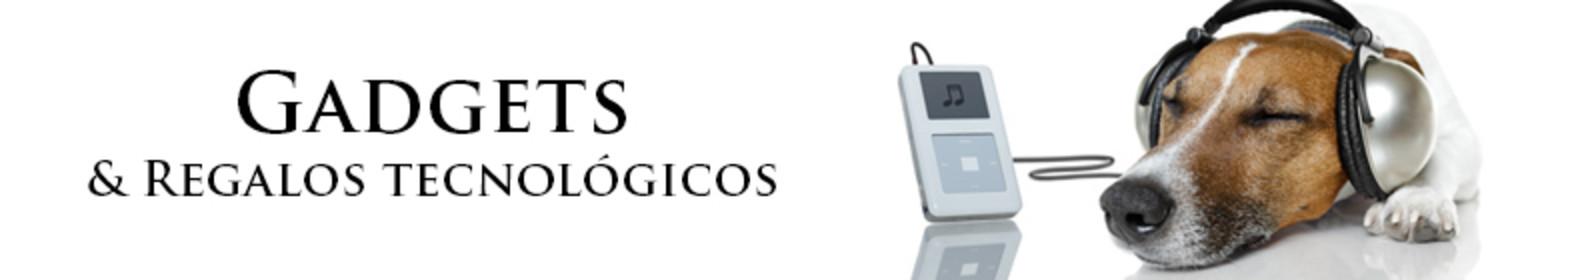 gadget-de-oferta-en-amazon2